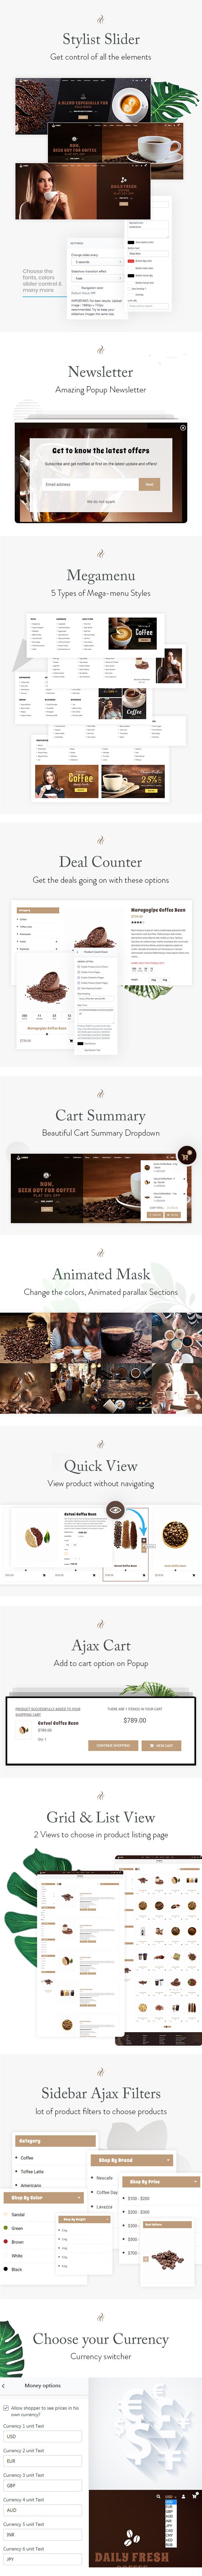 LaCafe - Coffee Shopify Theme - 2